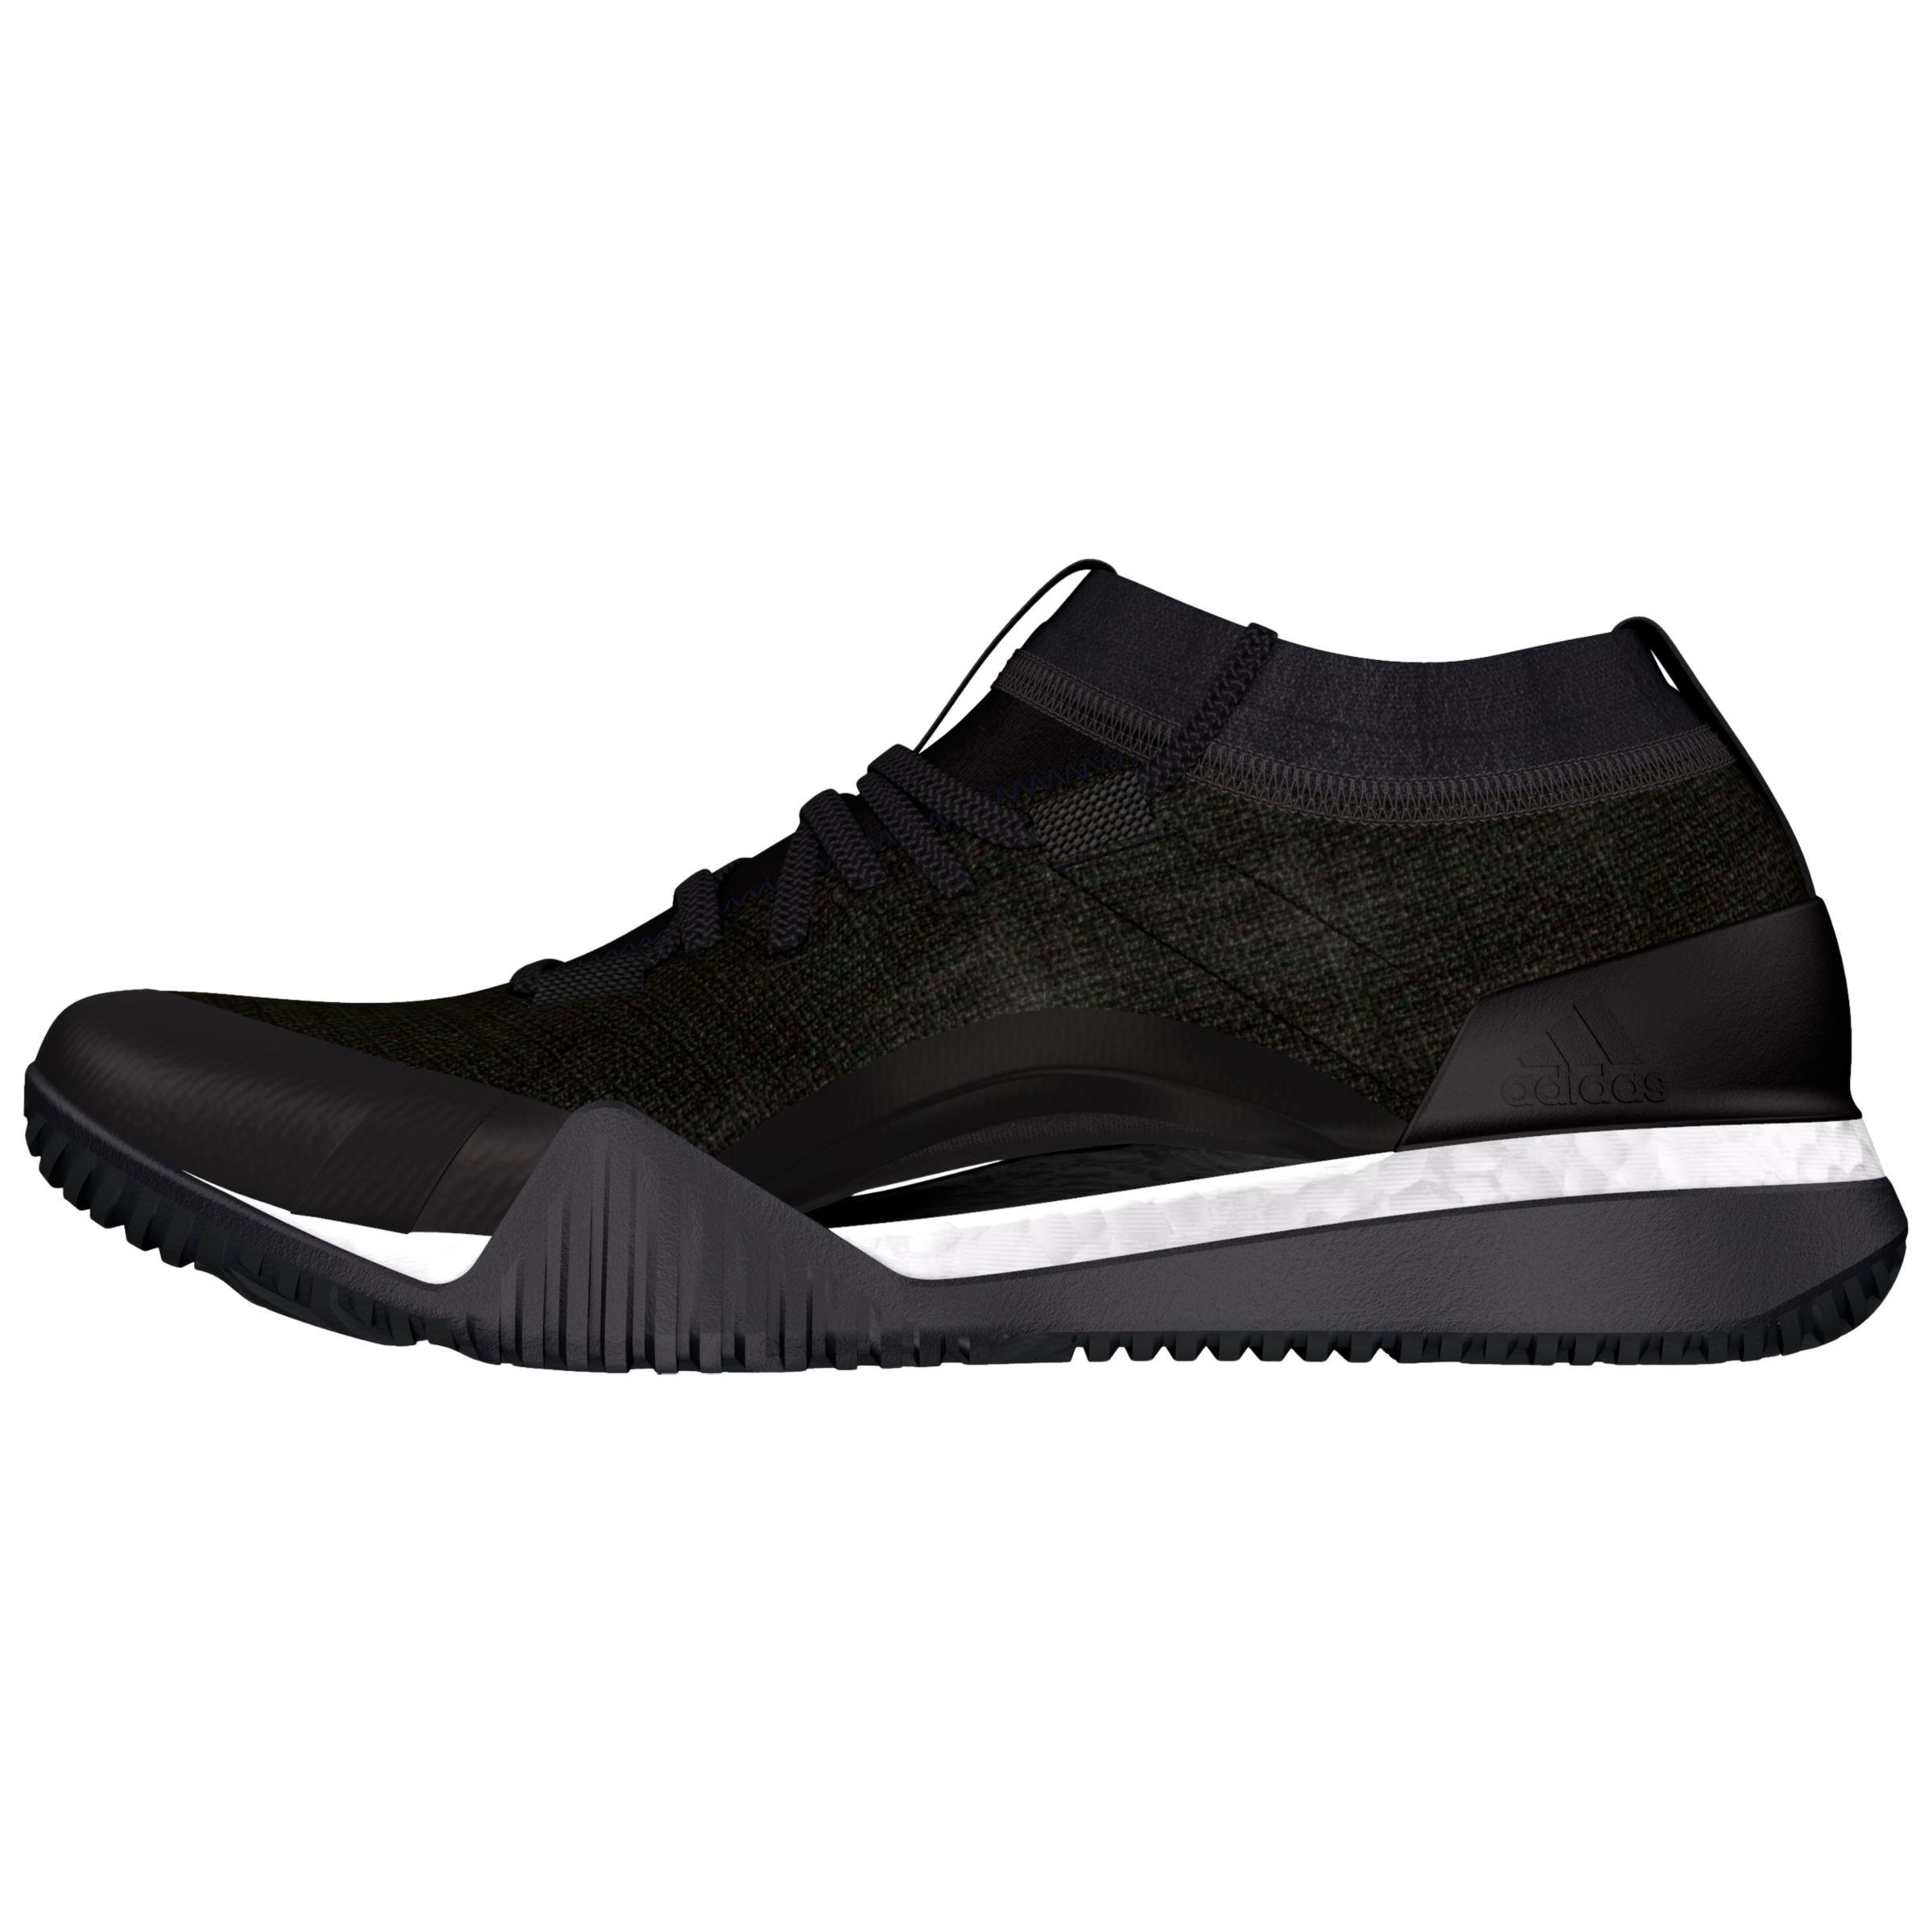 de10ed542 adidas Pure Boost X TR3 Training Shoes